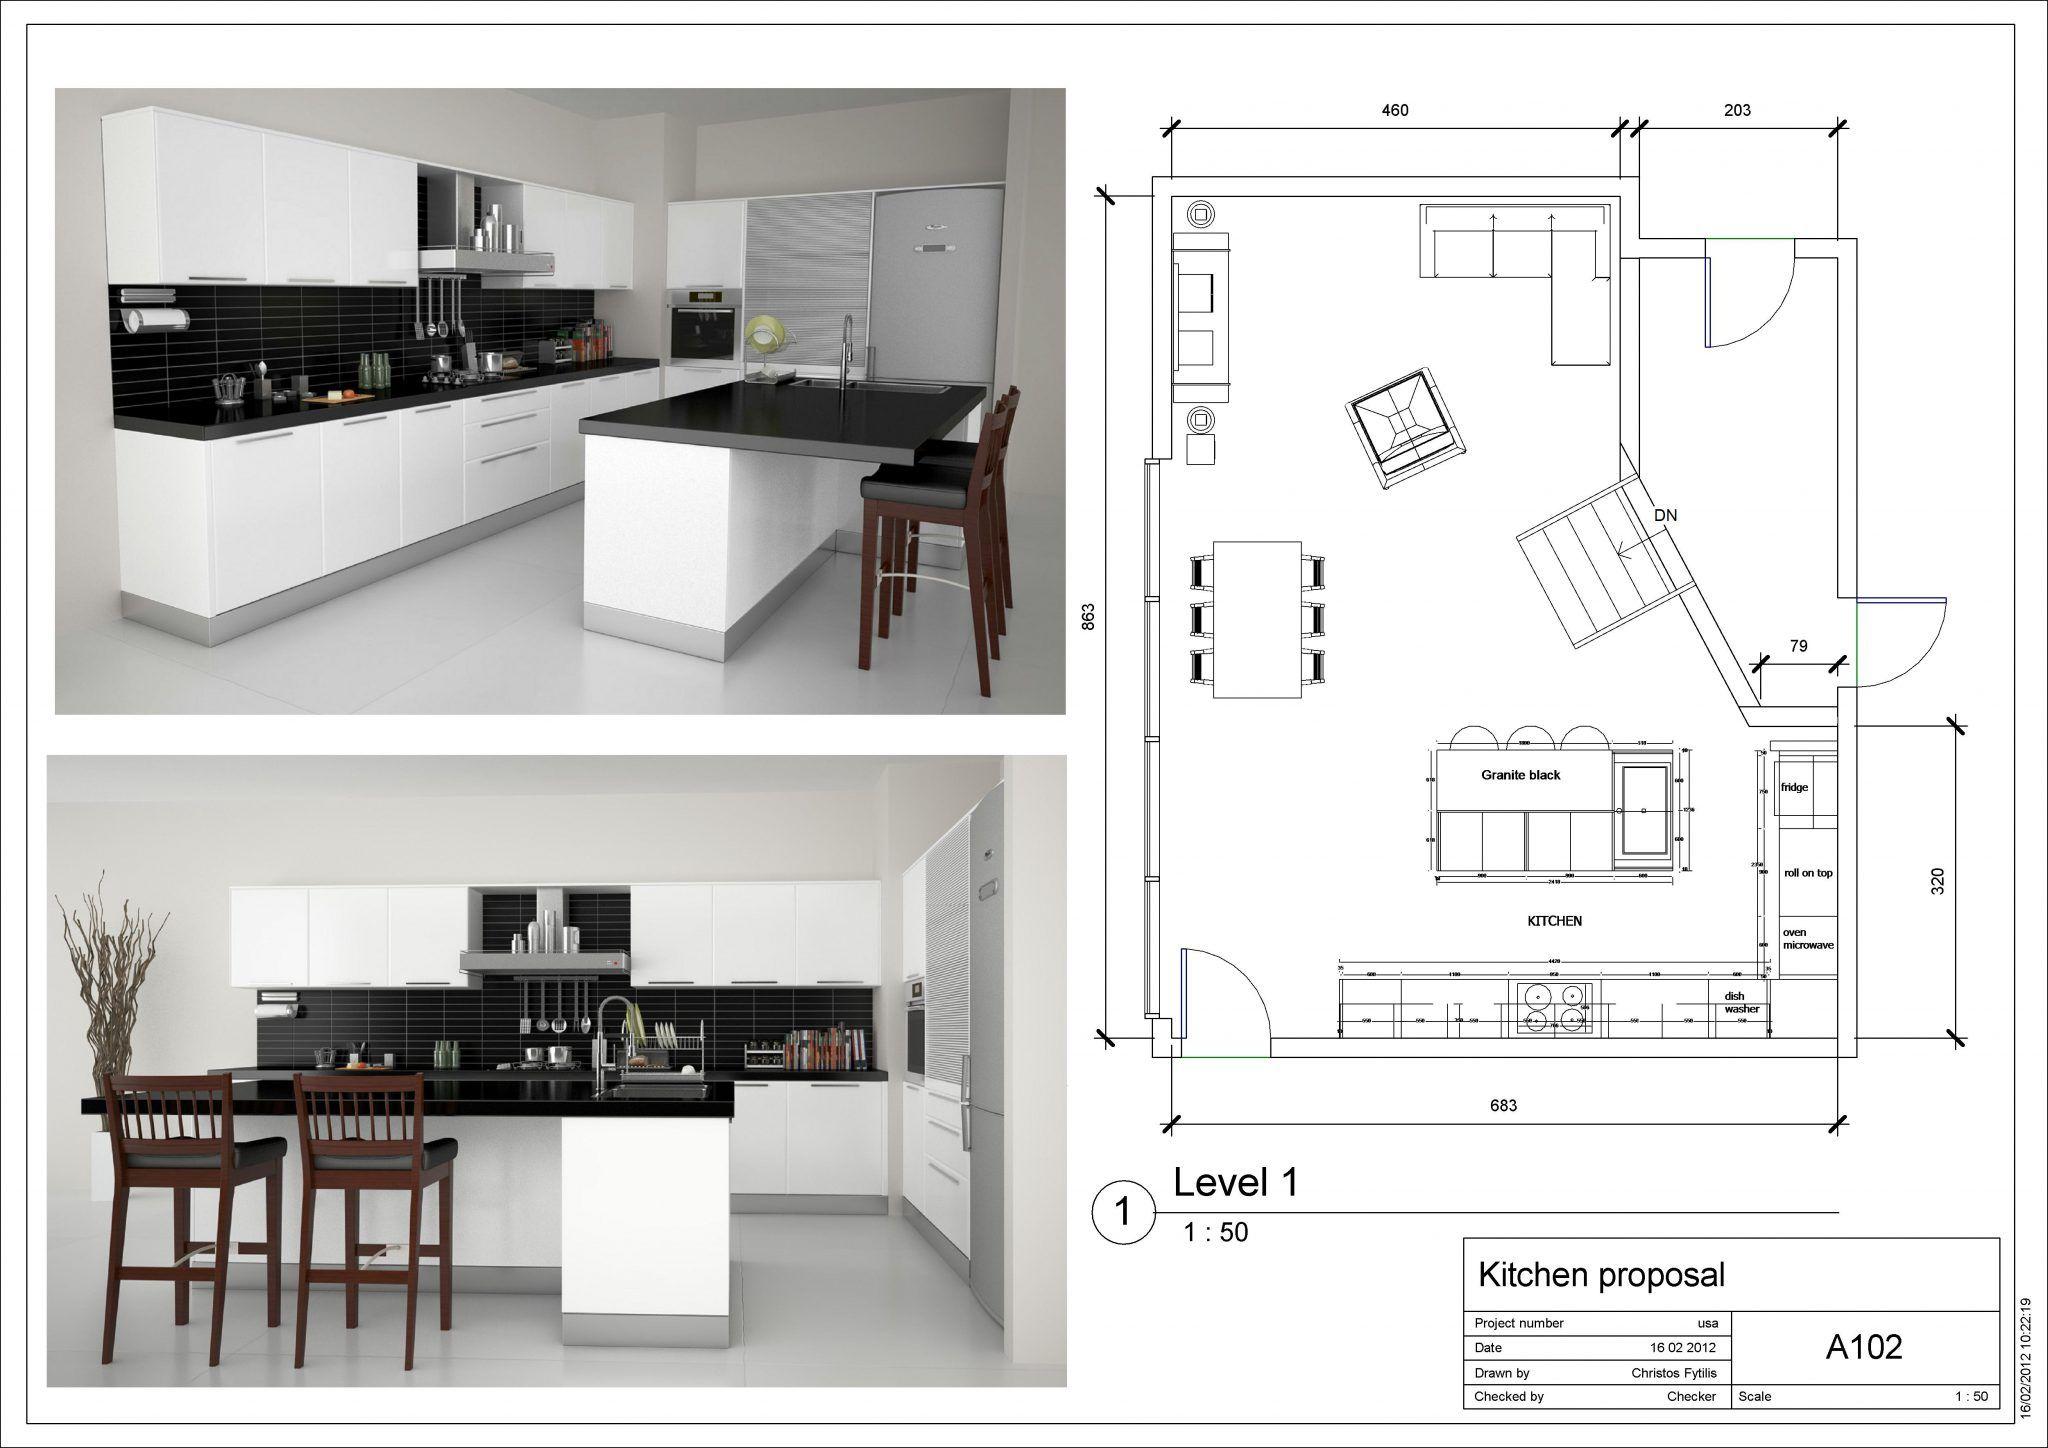 awesome small kitchen design allstateloghomes inside small kitchen ...